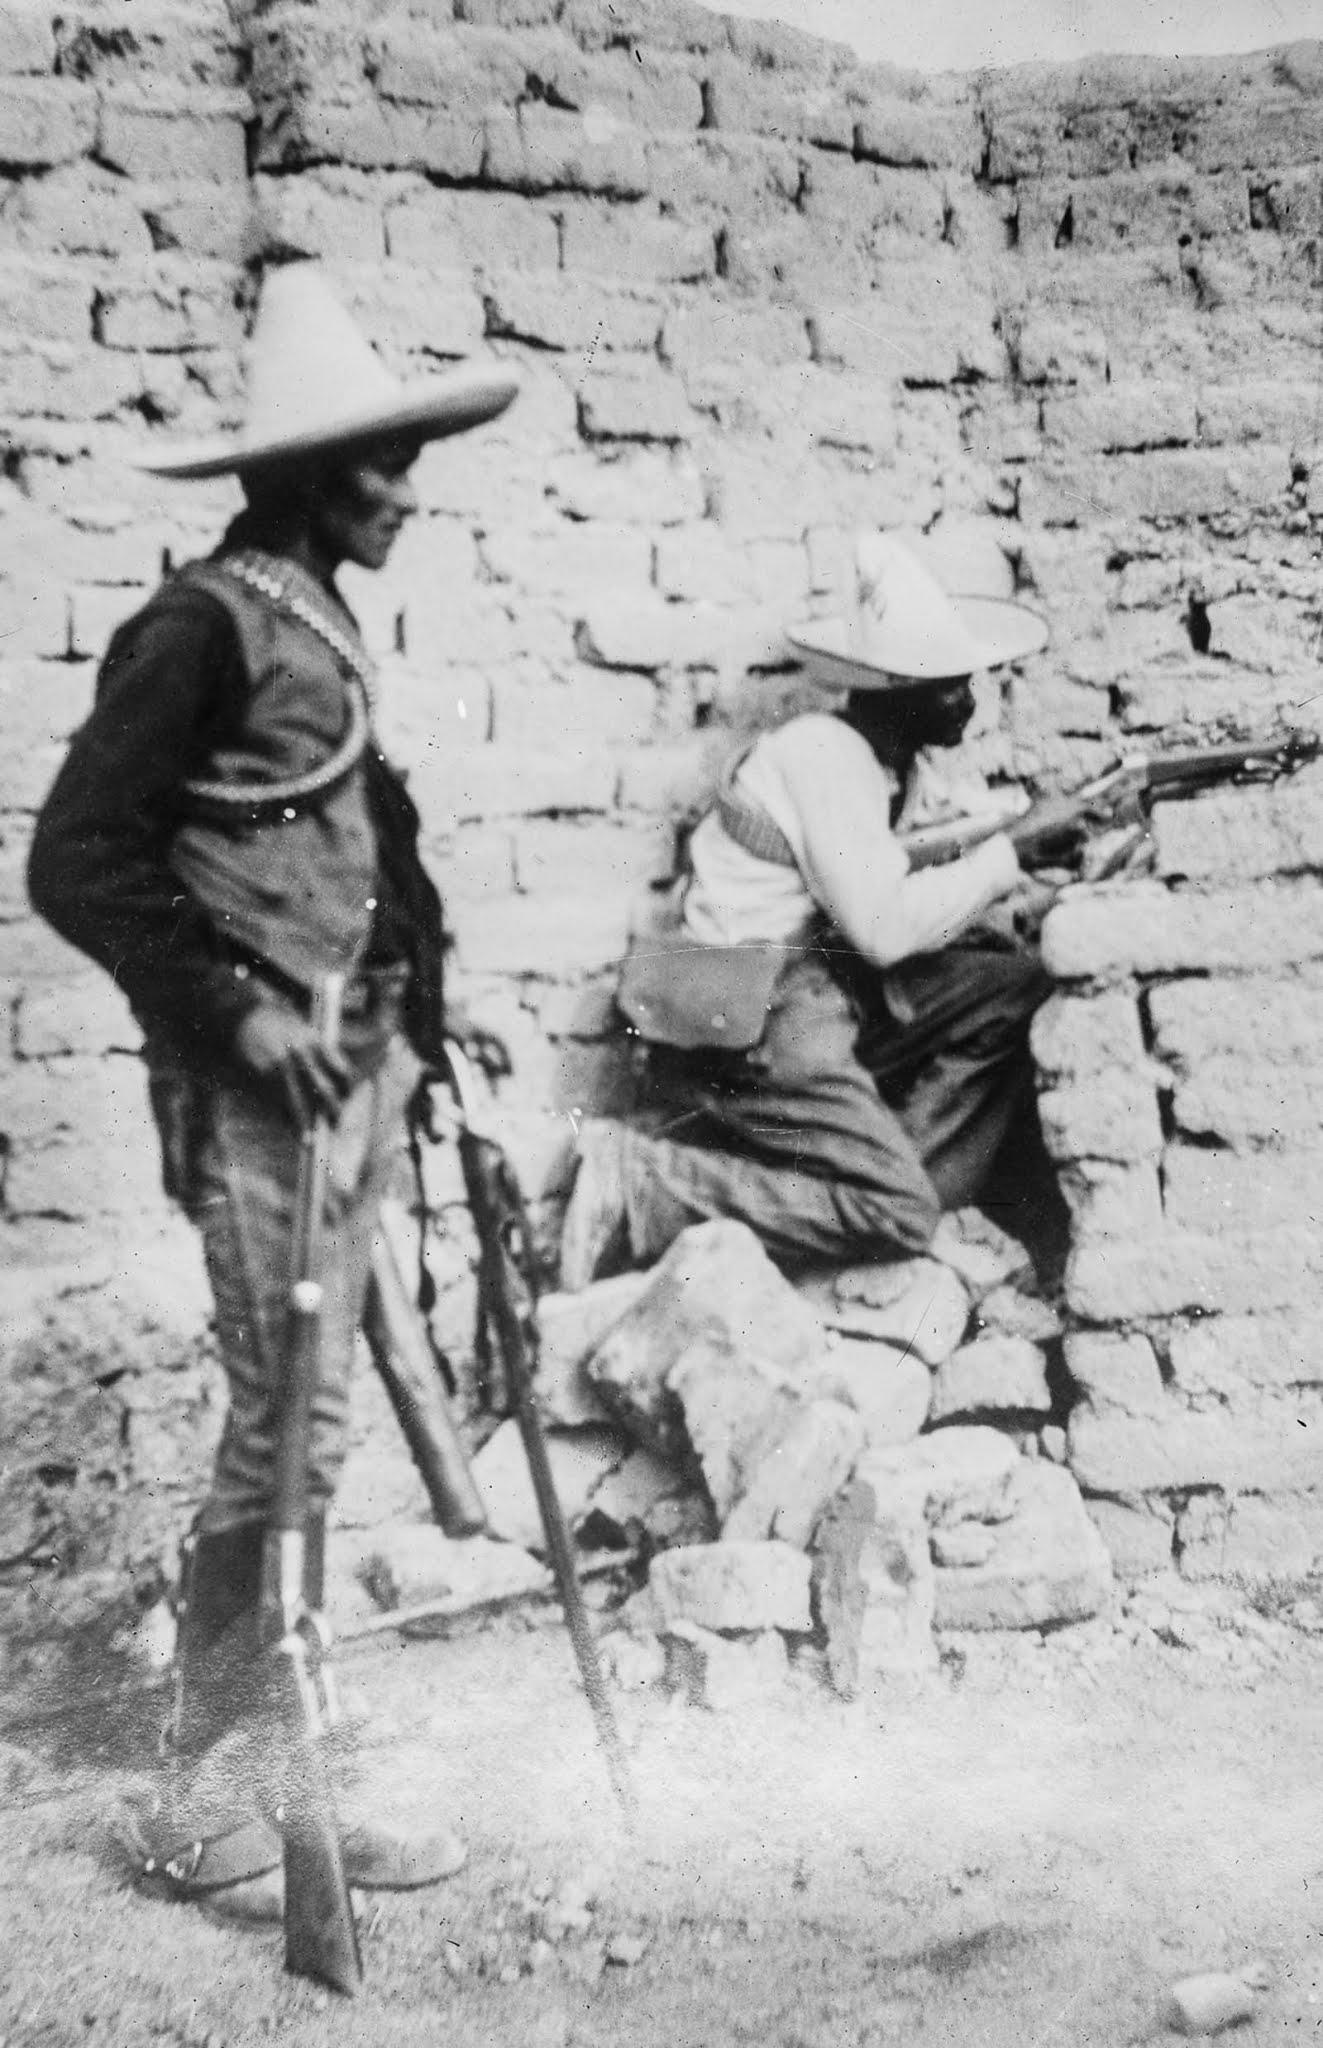 Rebels in a firing position in Ciudad Juárez.